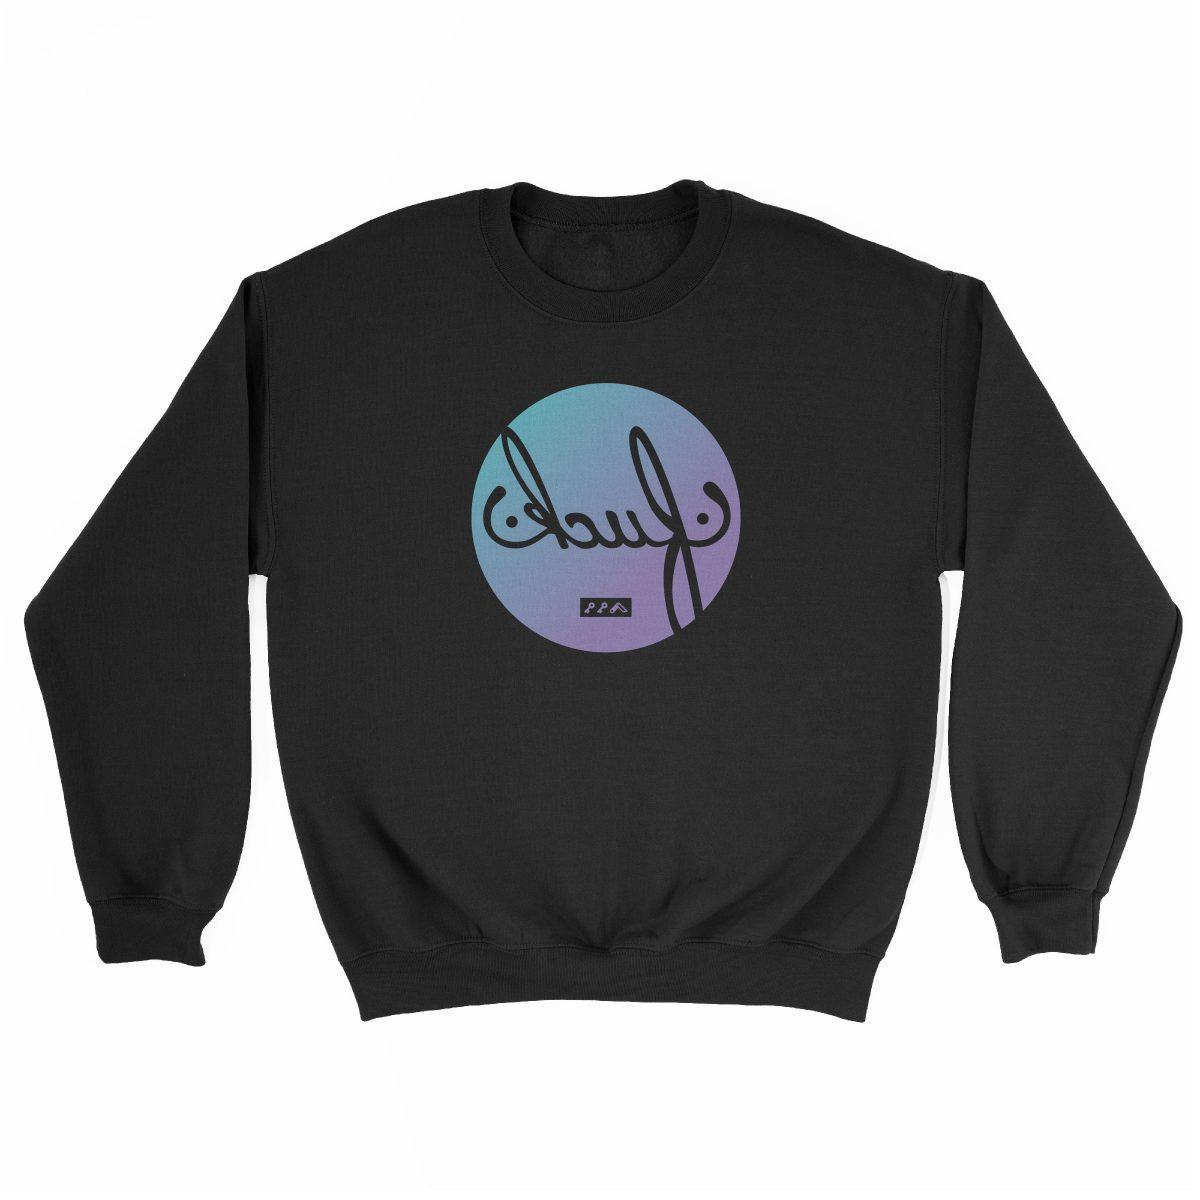 i give zero fucks sweatshirt black at kikicutt.com